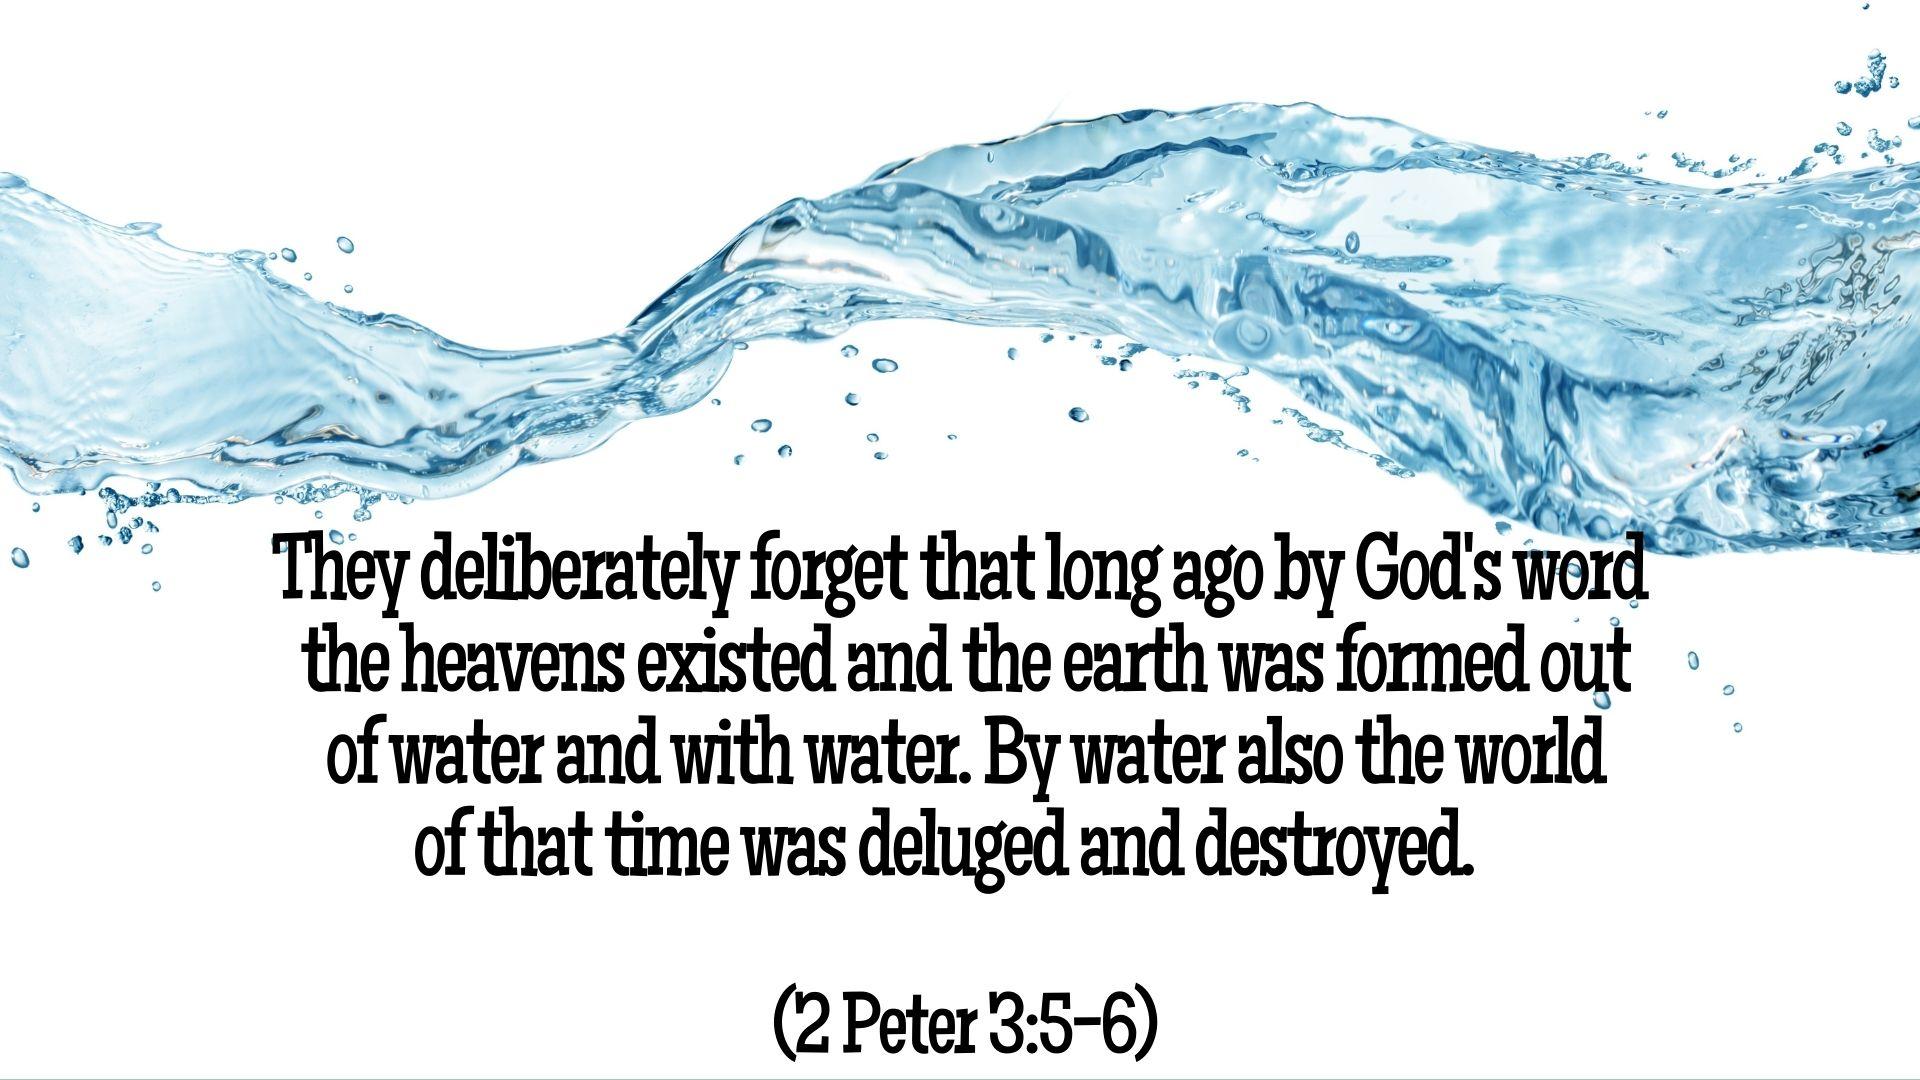 2 Peter 3.5-6